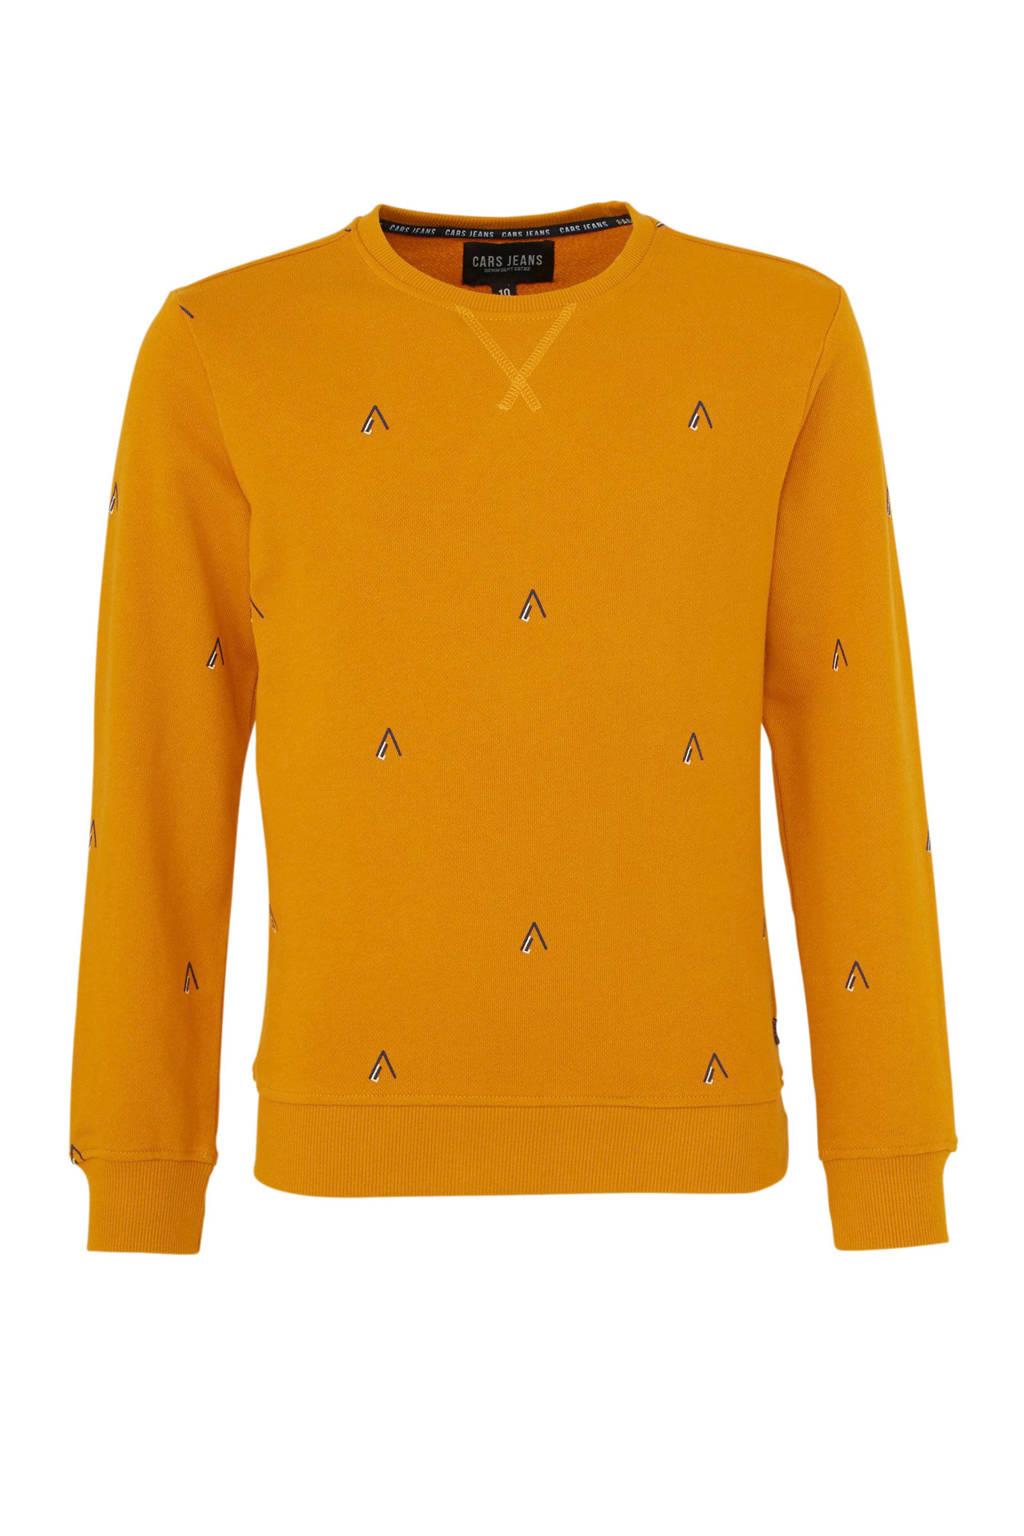 Cars sweater Cento met all over print okergeel, Okergeel